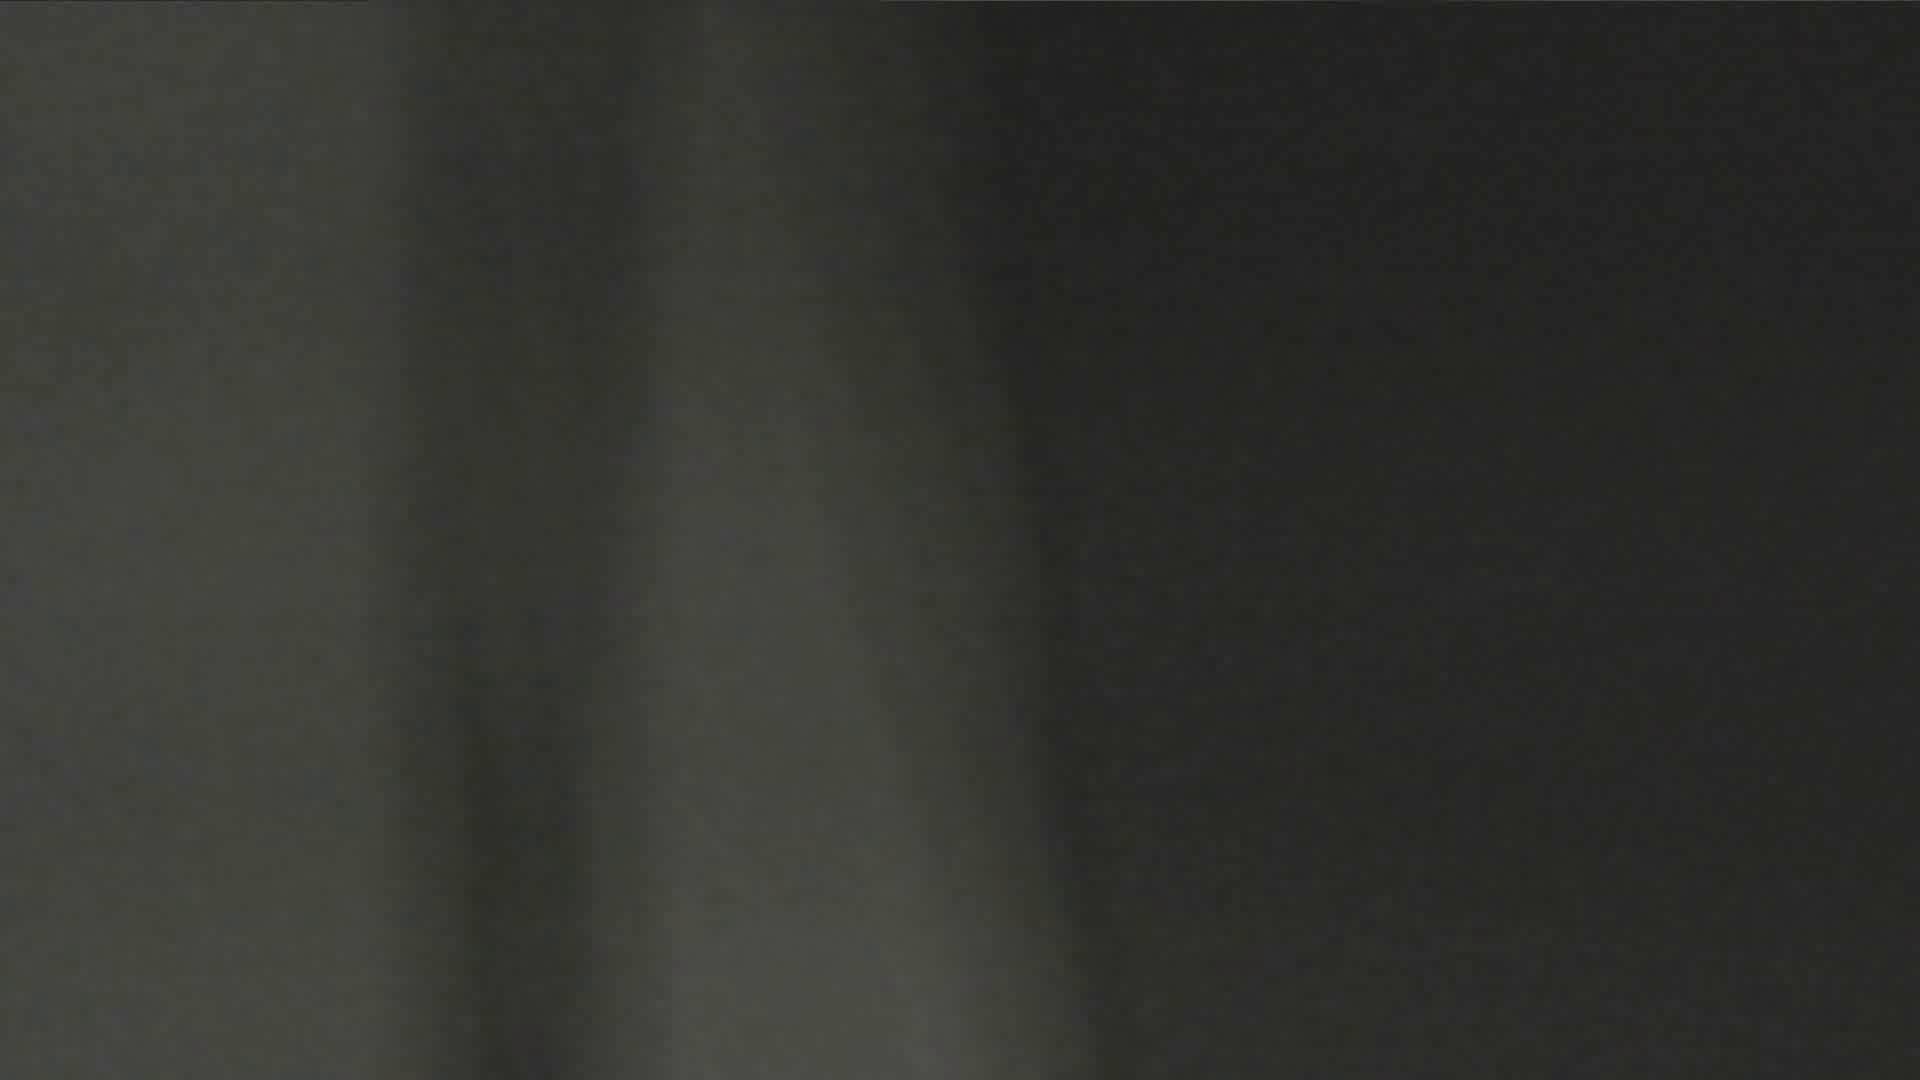 vol.02 着替えシーンもありマス 丸見え ワレメ無修正動画無料 109画像 27